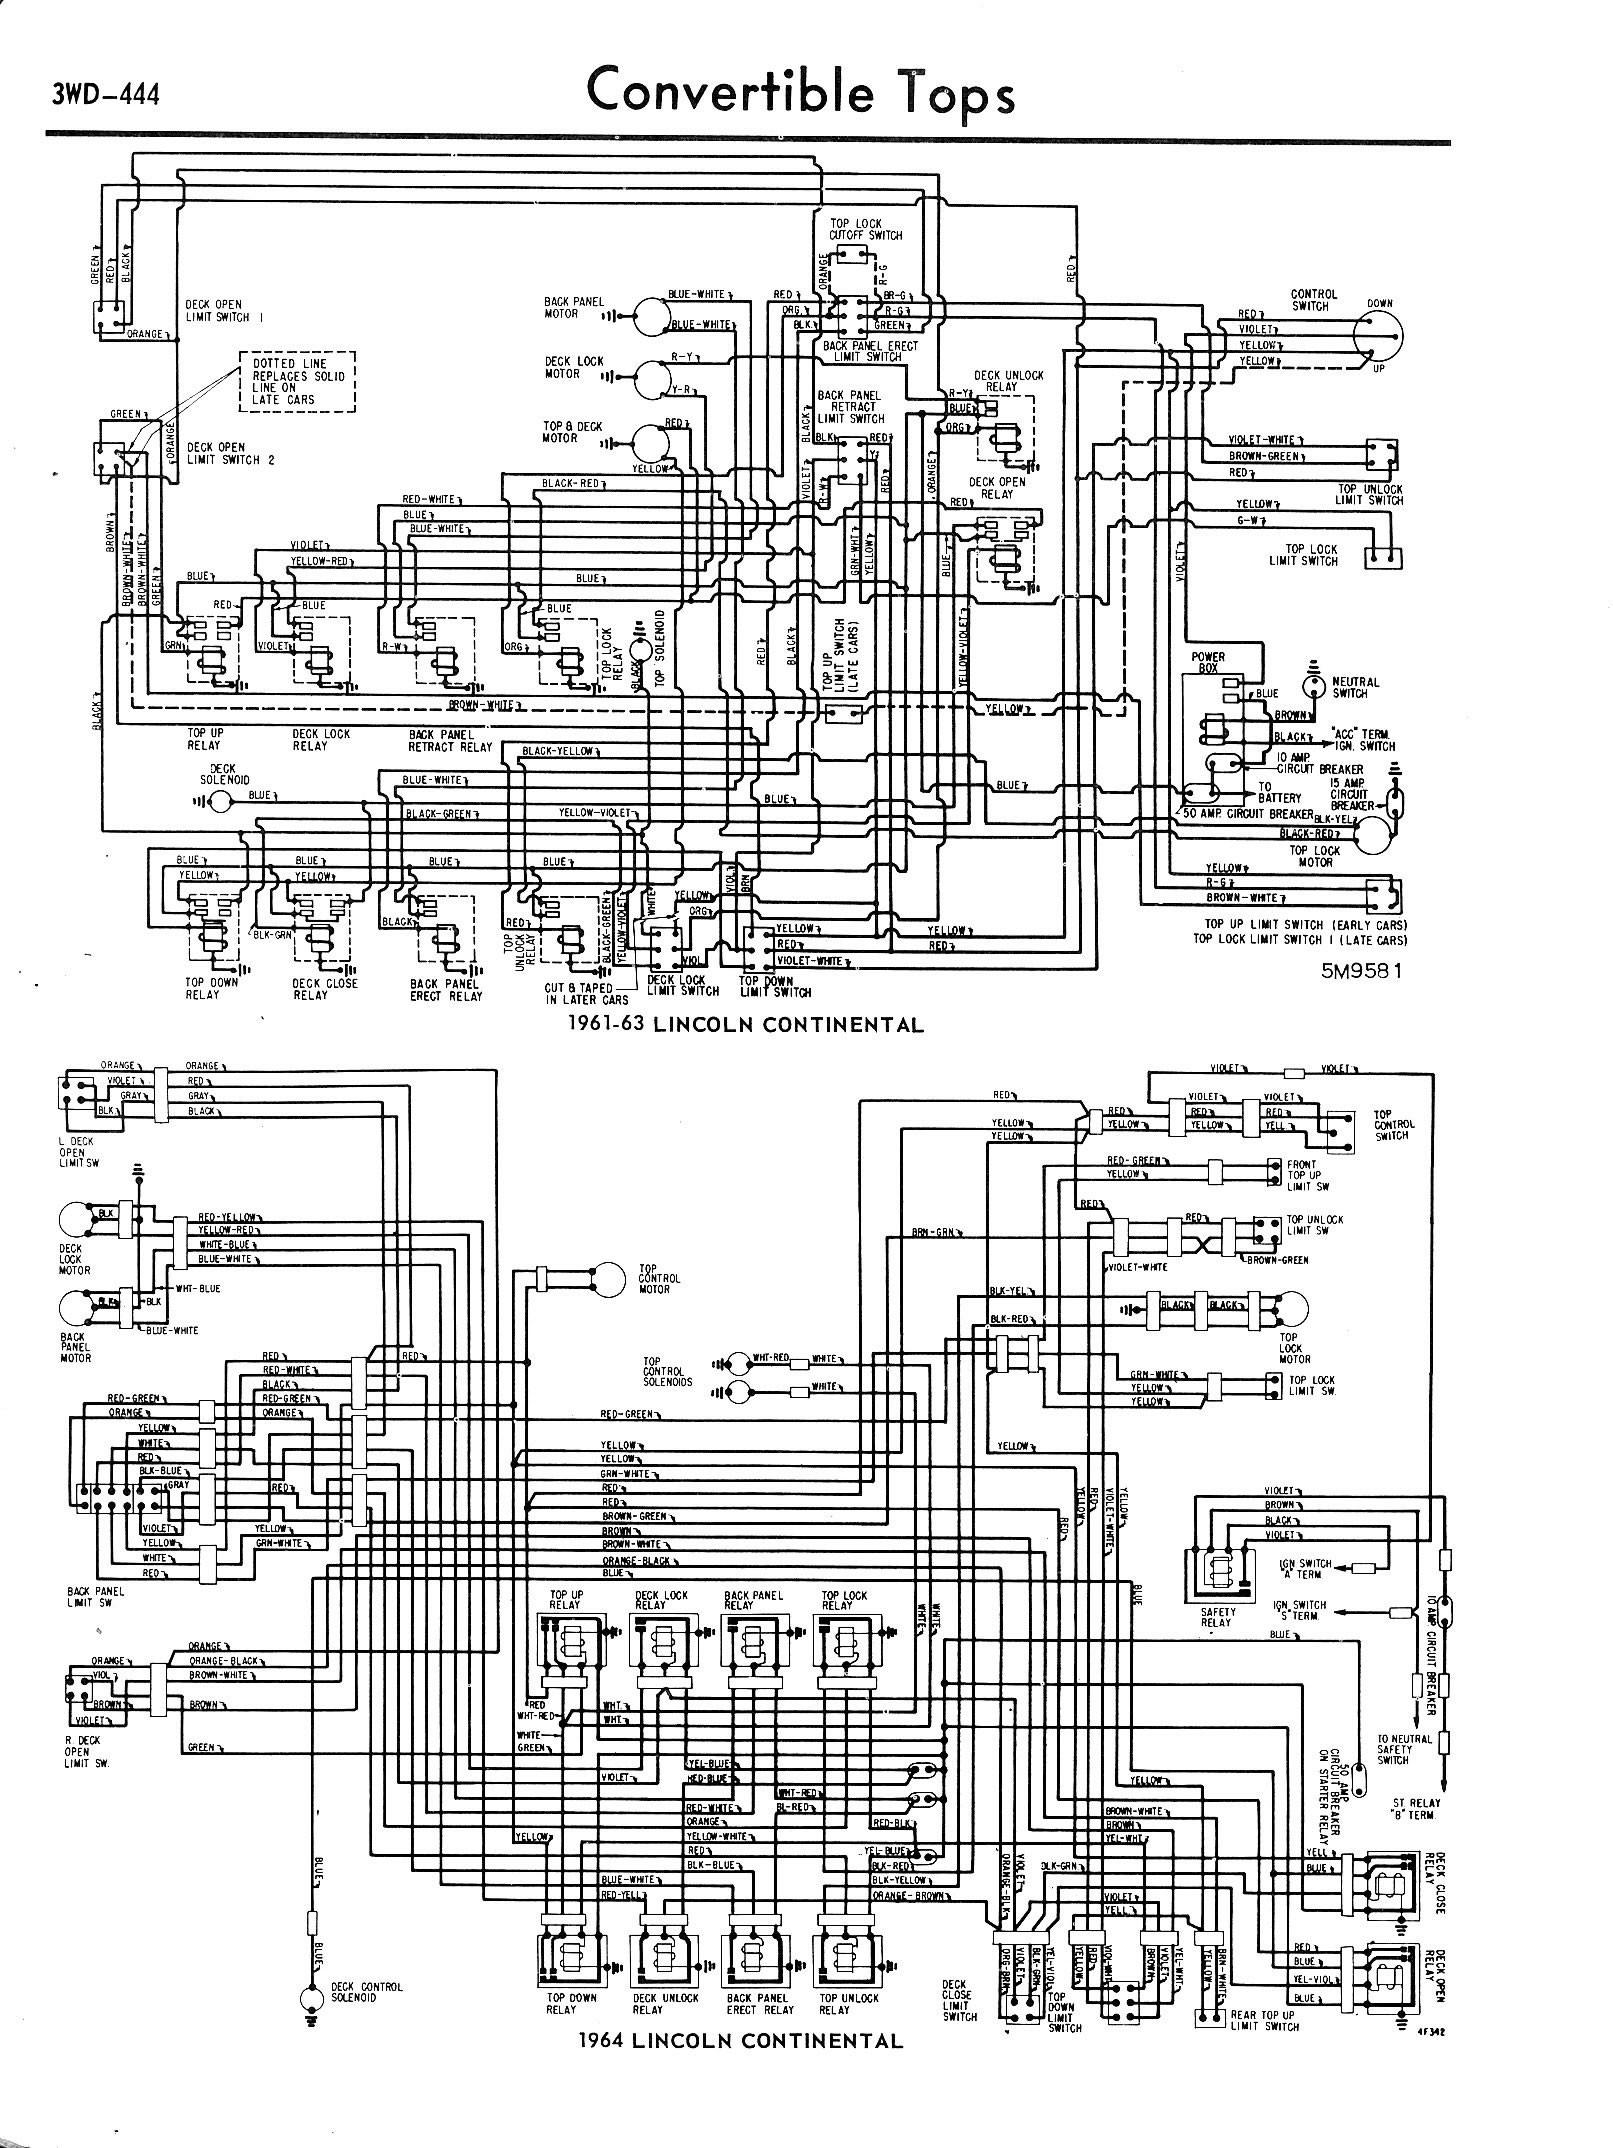 Wiring Diagram Moreover 1966 Chevrolet Impala Wiring Diagram On 74